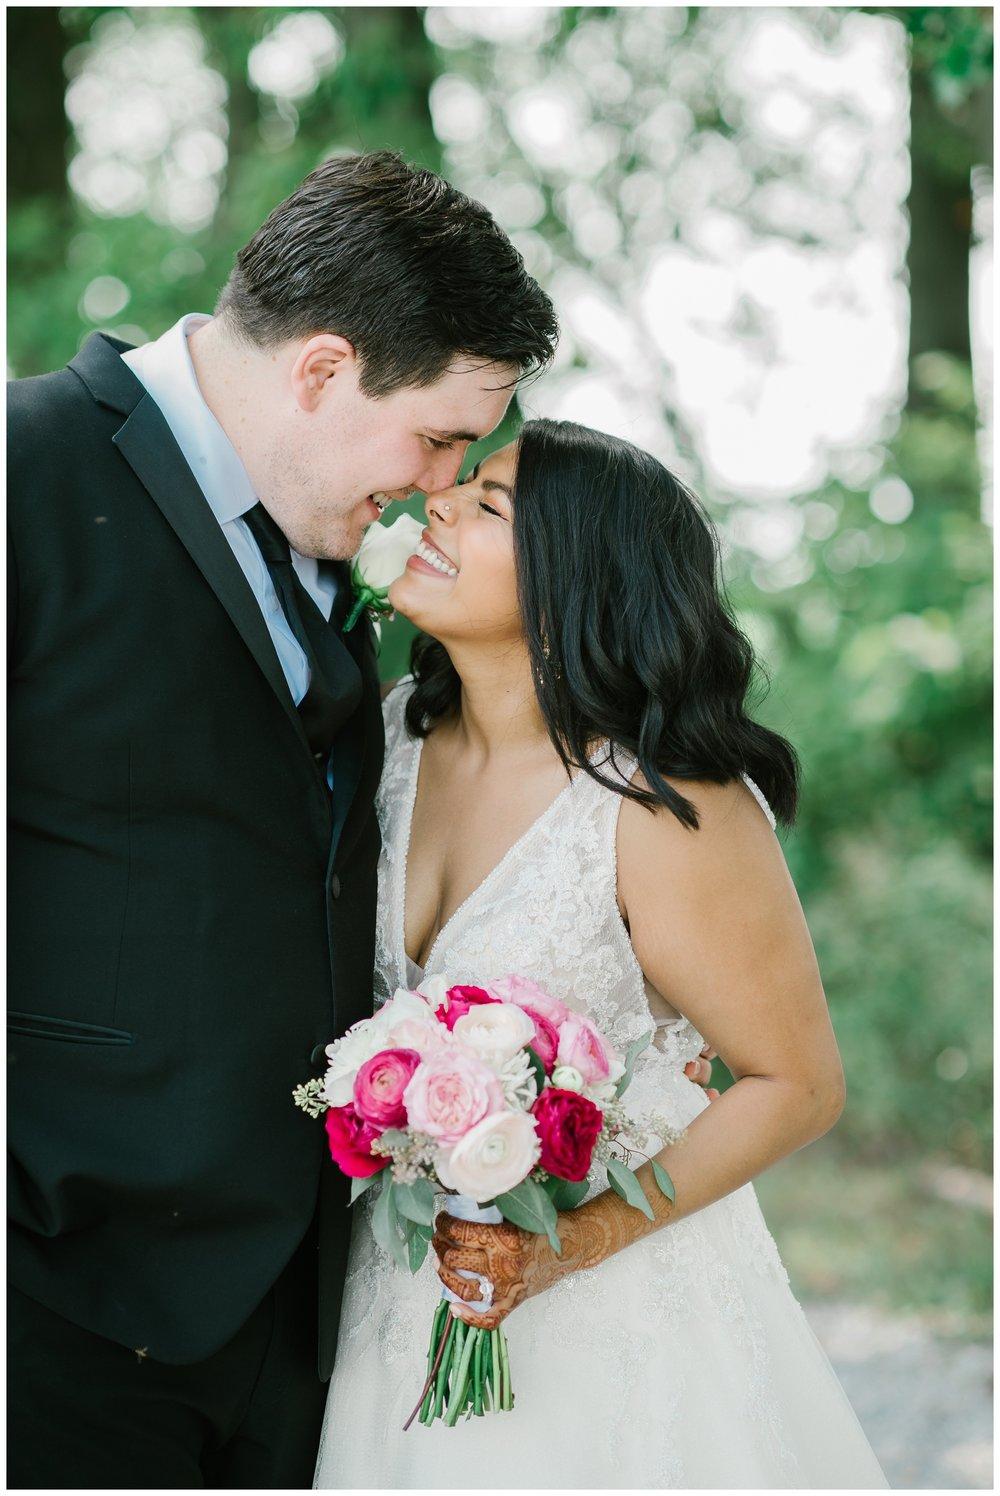 Rebecca_Bridges_Photography_Indianapolis_Wedding_Photographer_6928.jpg